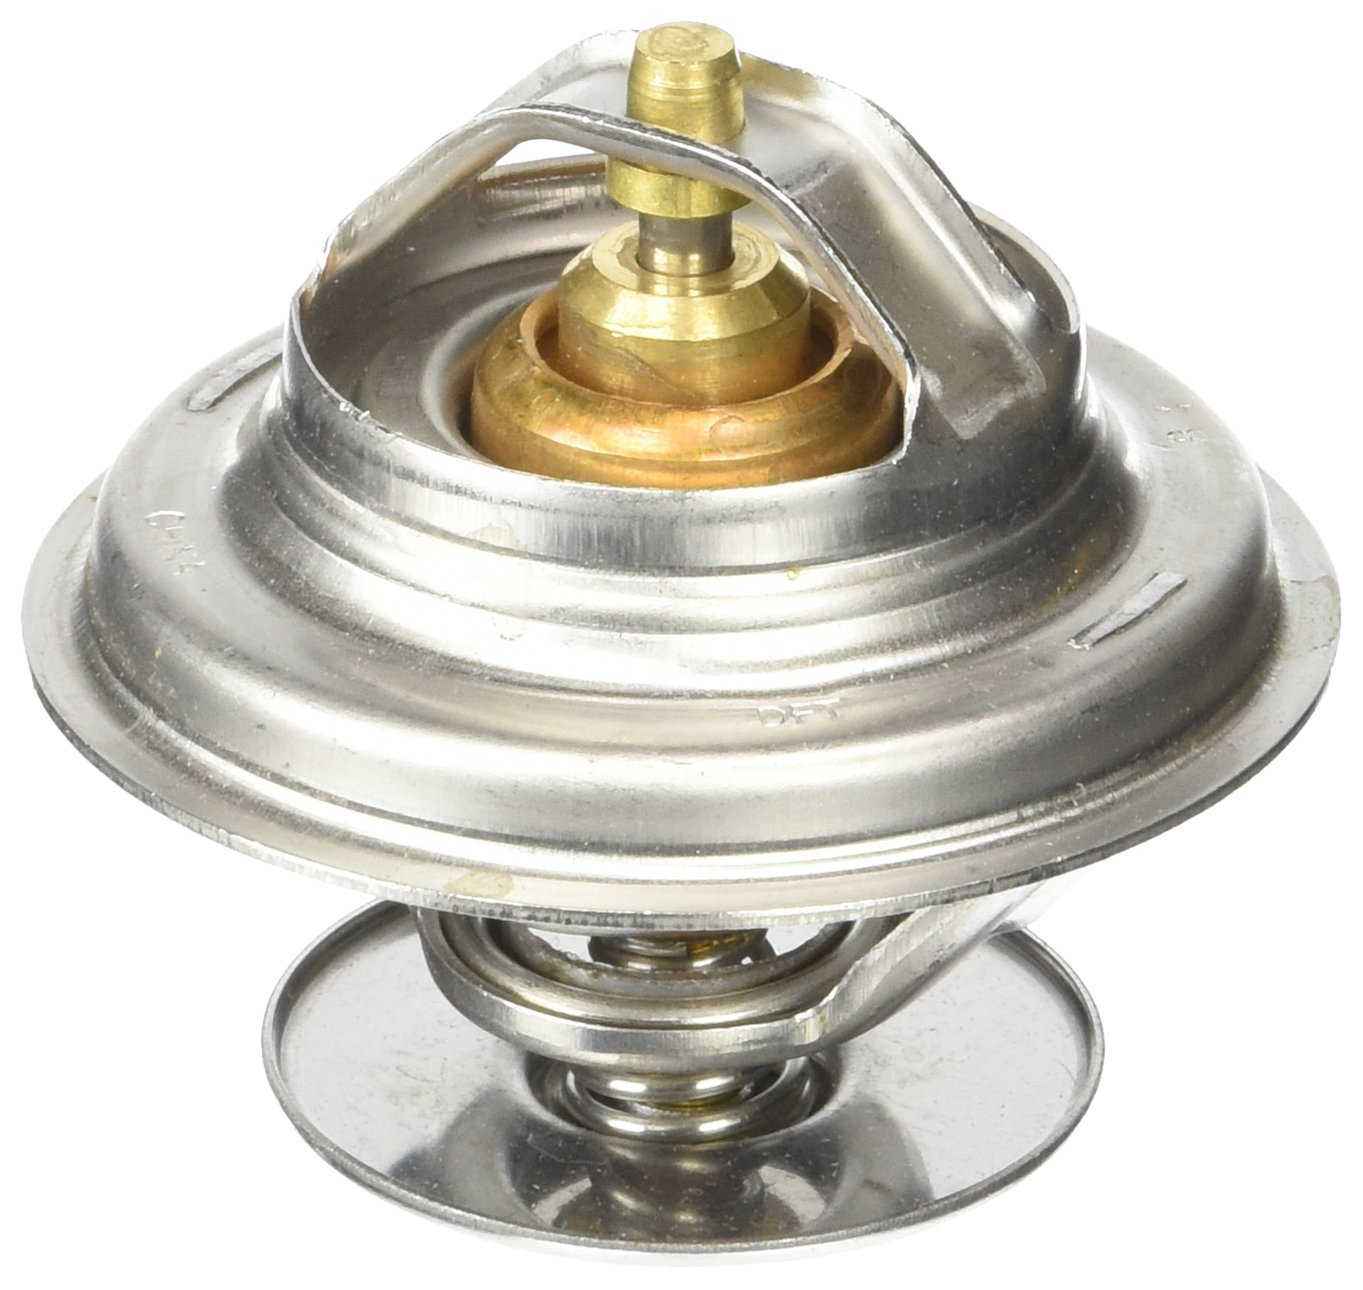 Stant 13649 Thermostat - 190 Degrees Fahrenheit